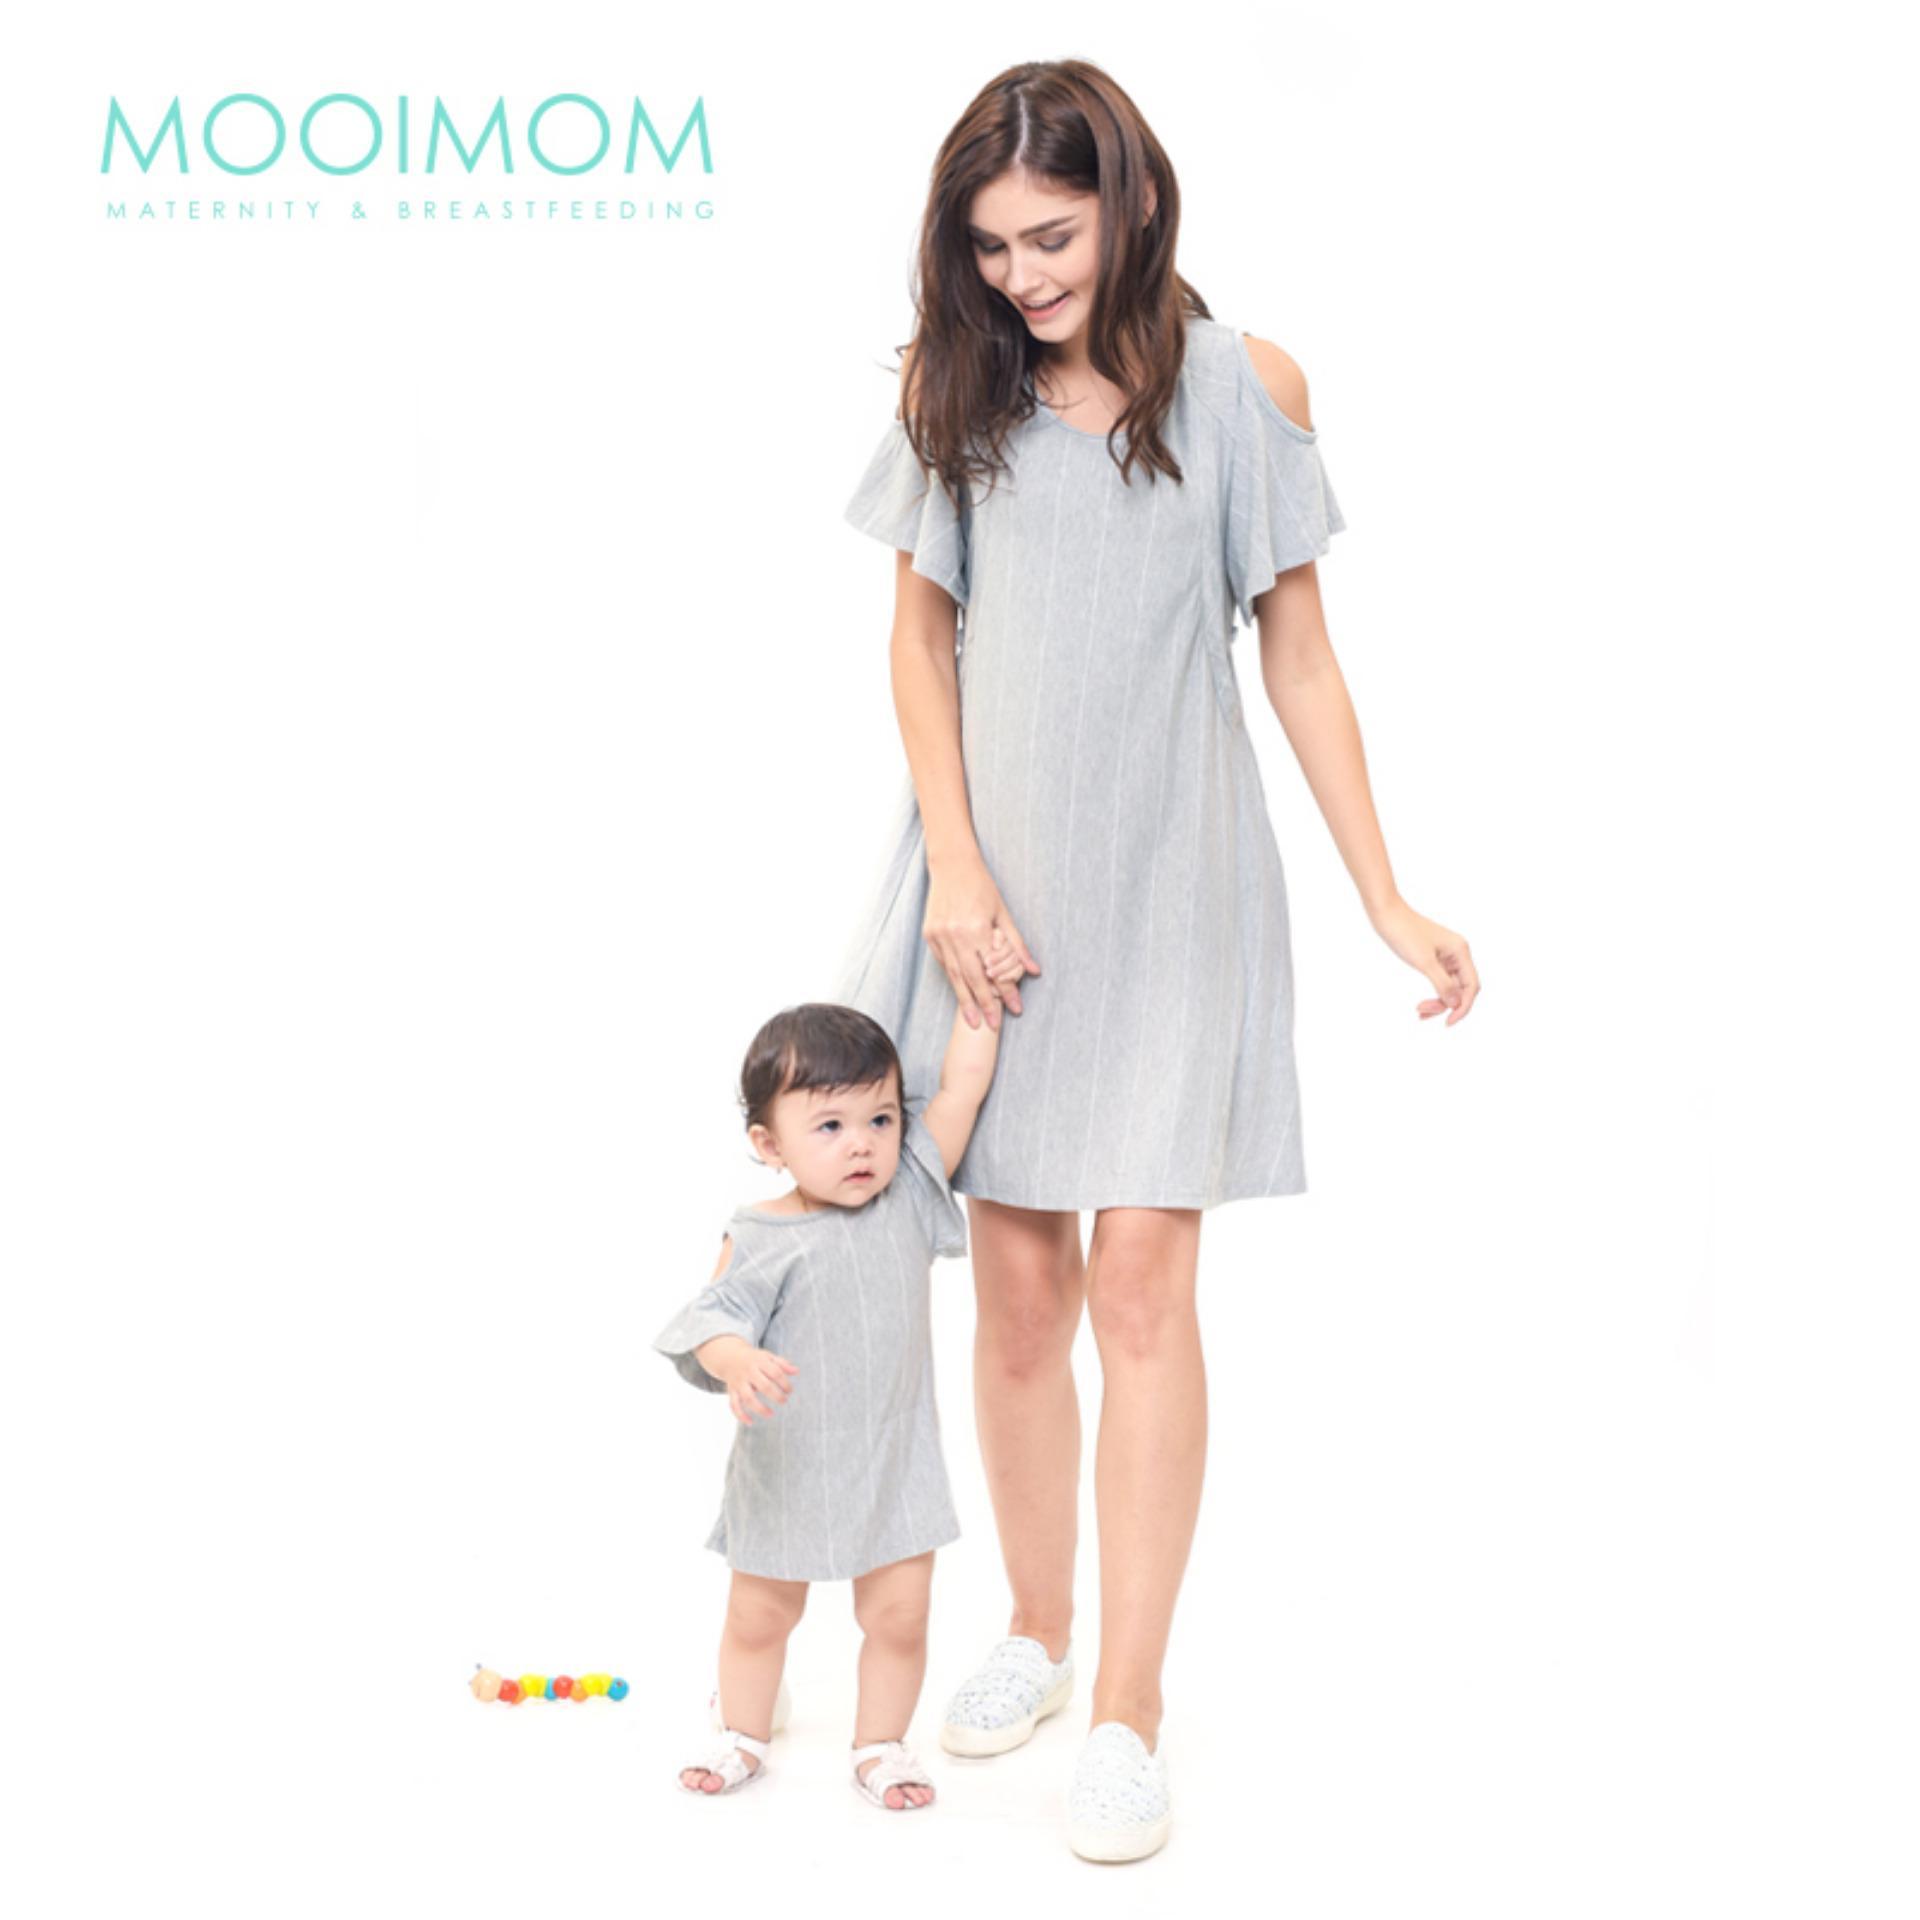 MOOIMOM Cold Shoulder Nursing Dress & Baby Clothes Baju Hamil Menyusui Couple Ibu Anak - Grey Girl